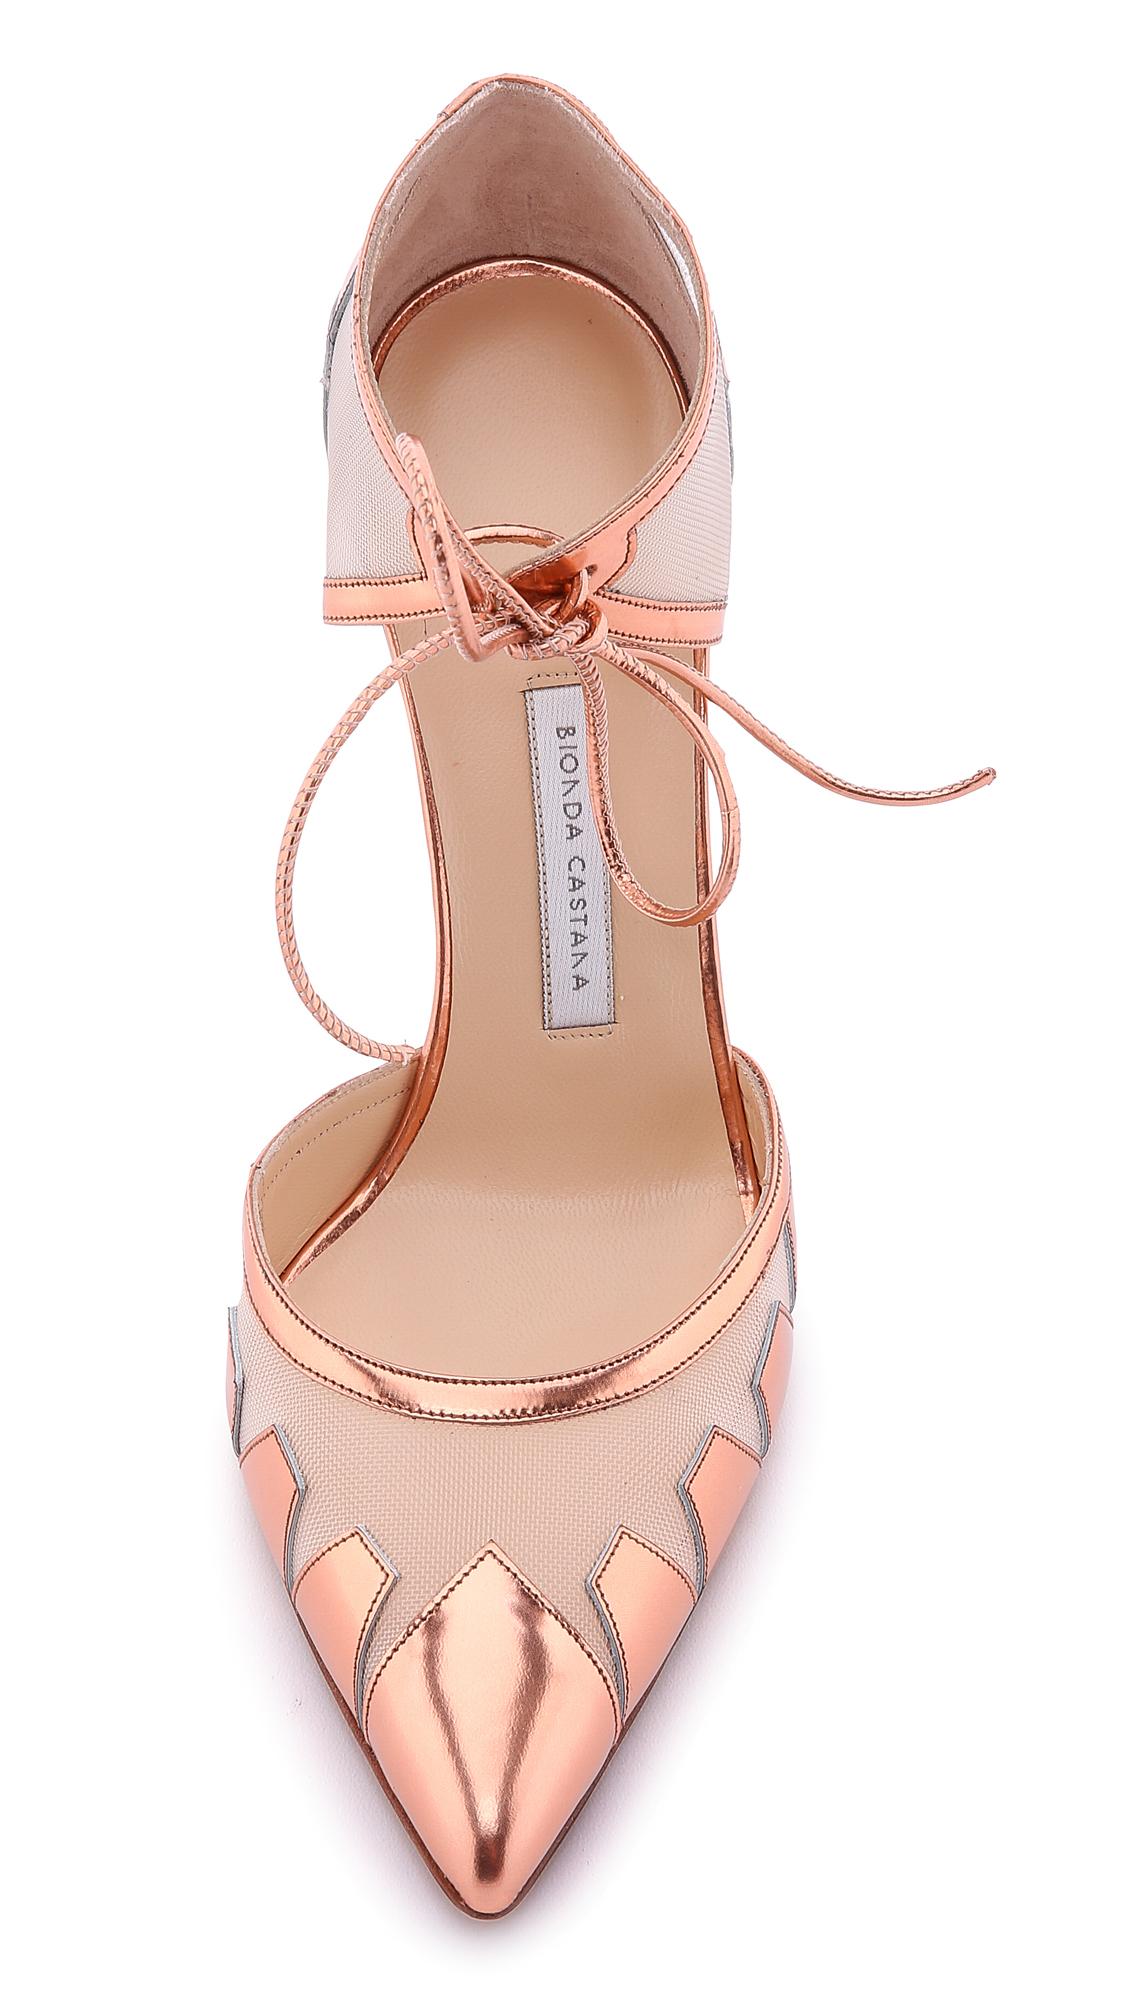 98c386bcaccf Bionda Castana Lana Metallic D Orsay Pumps - Rose Gold in Pink - Lyst